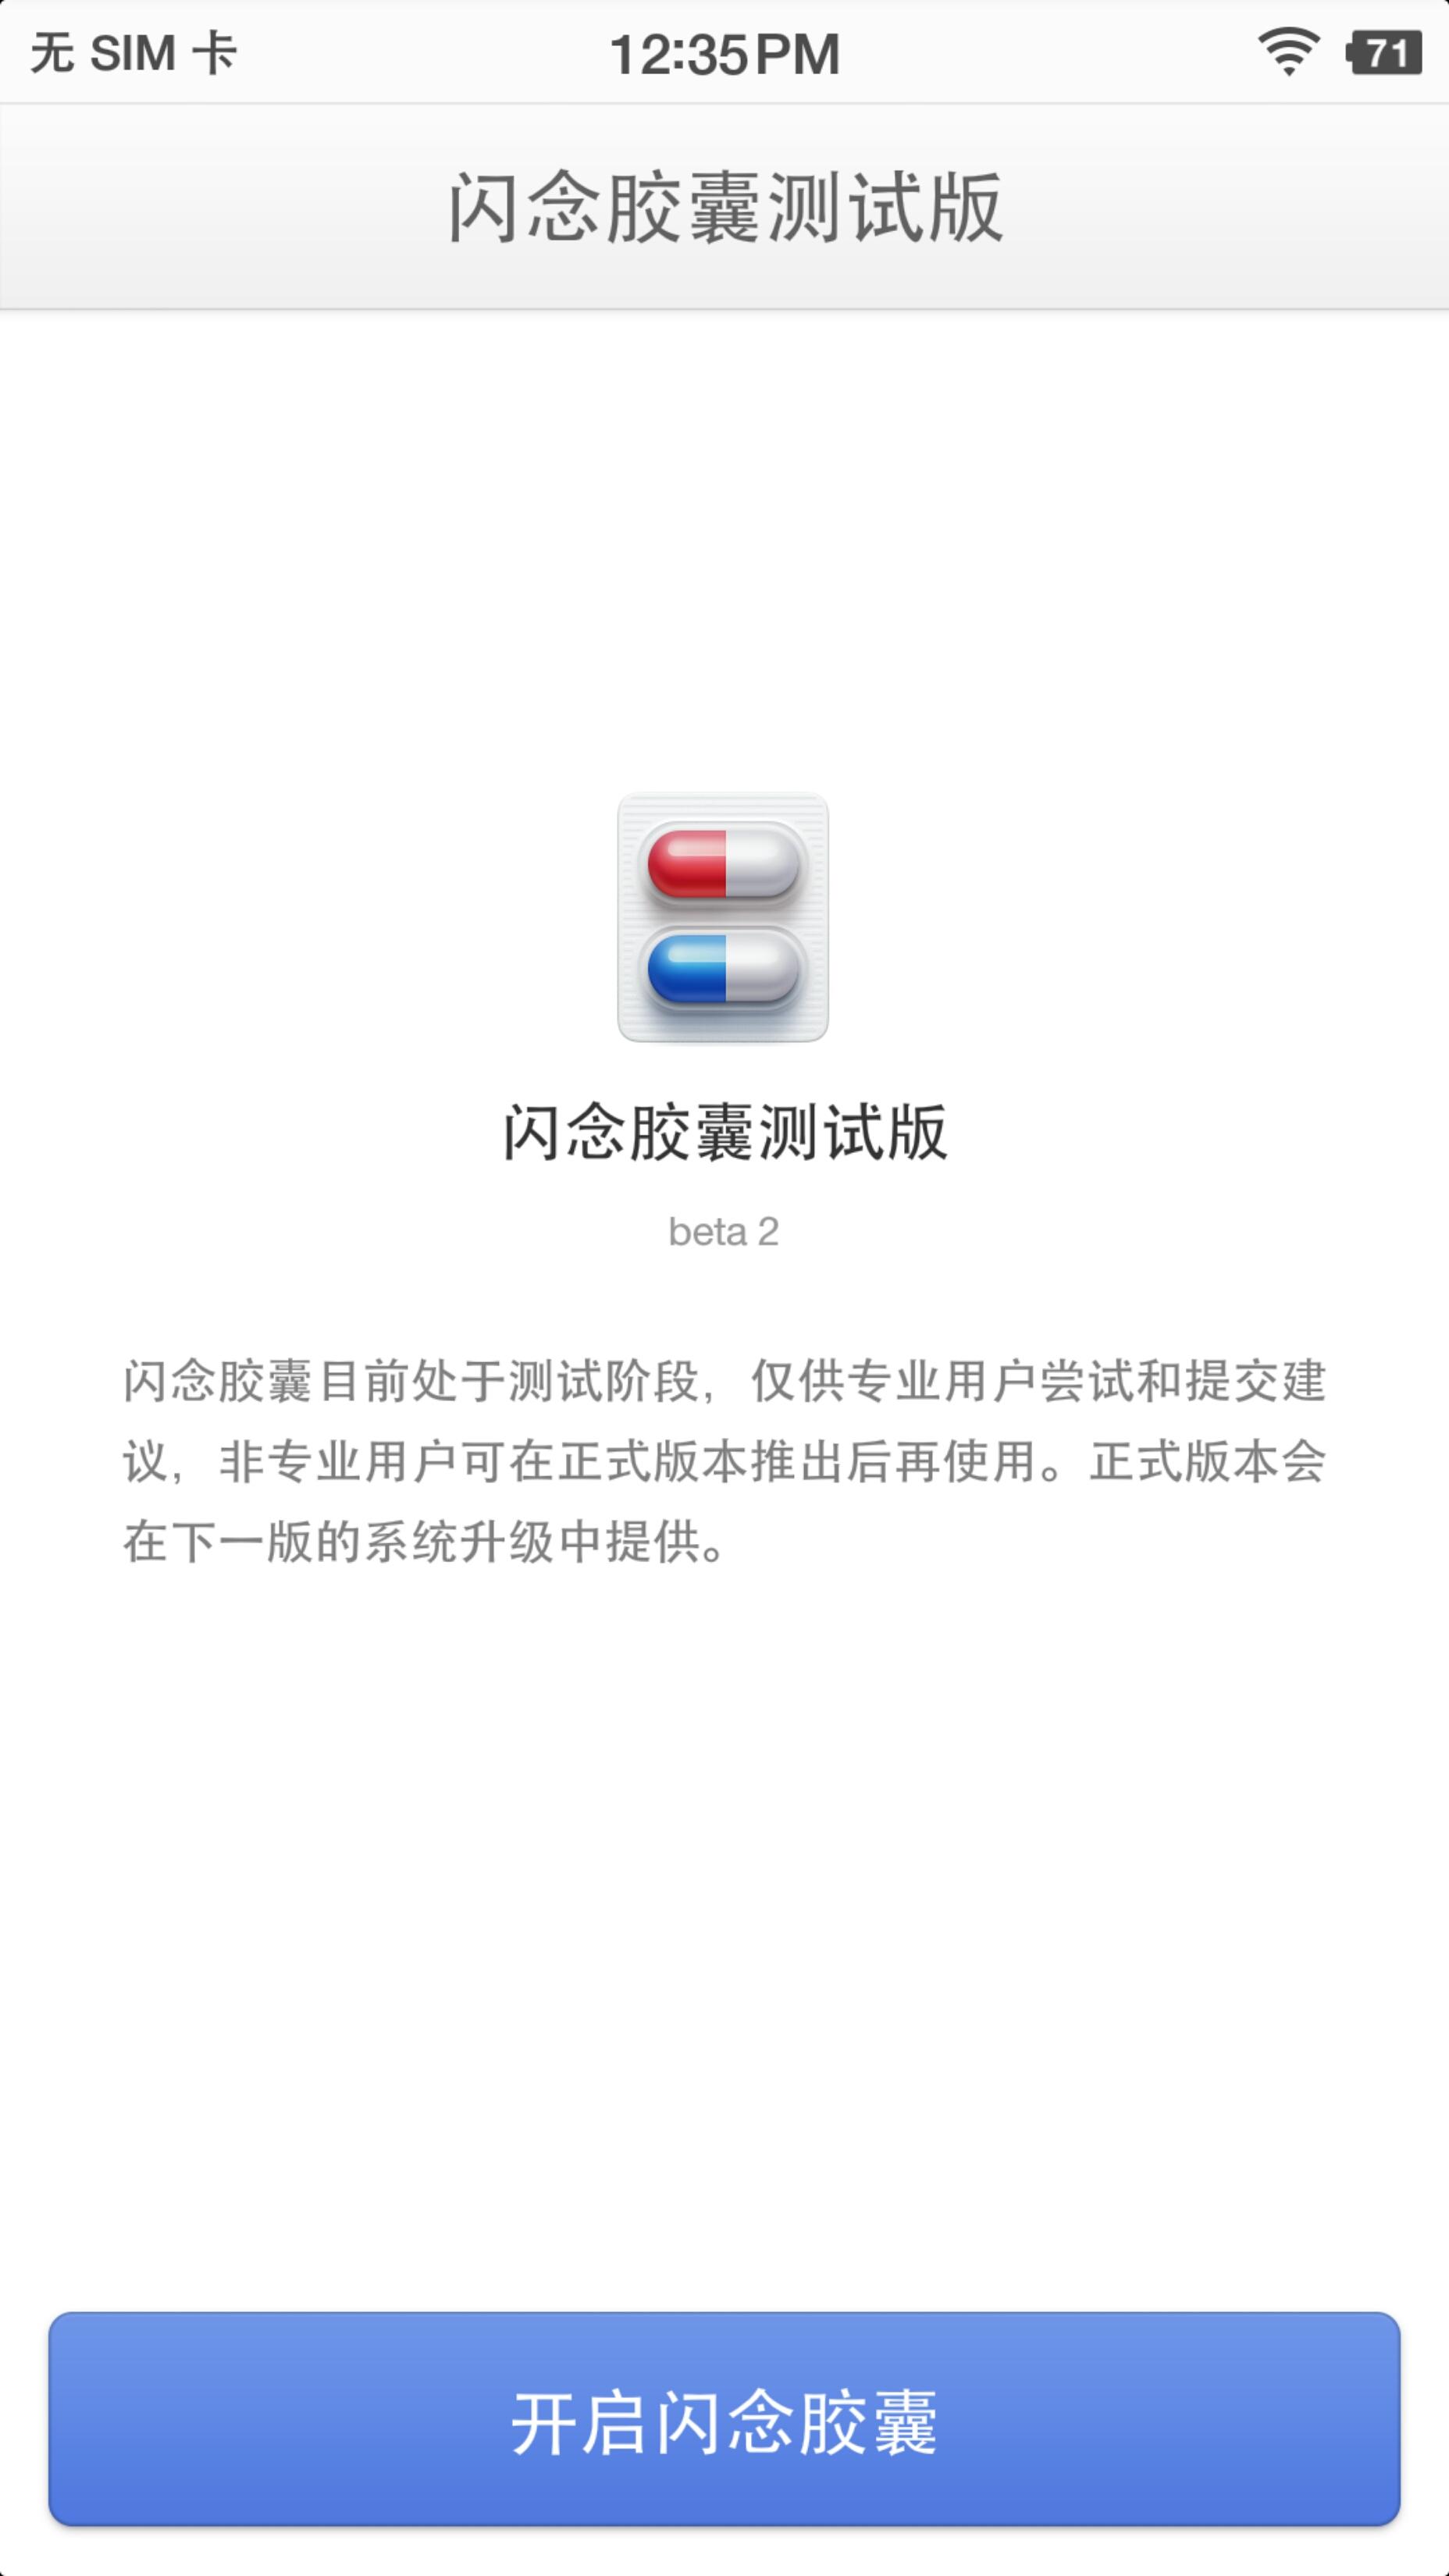 Screenshot_2018-10-06-12-36-00-755_????.png